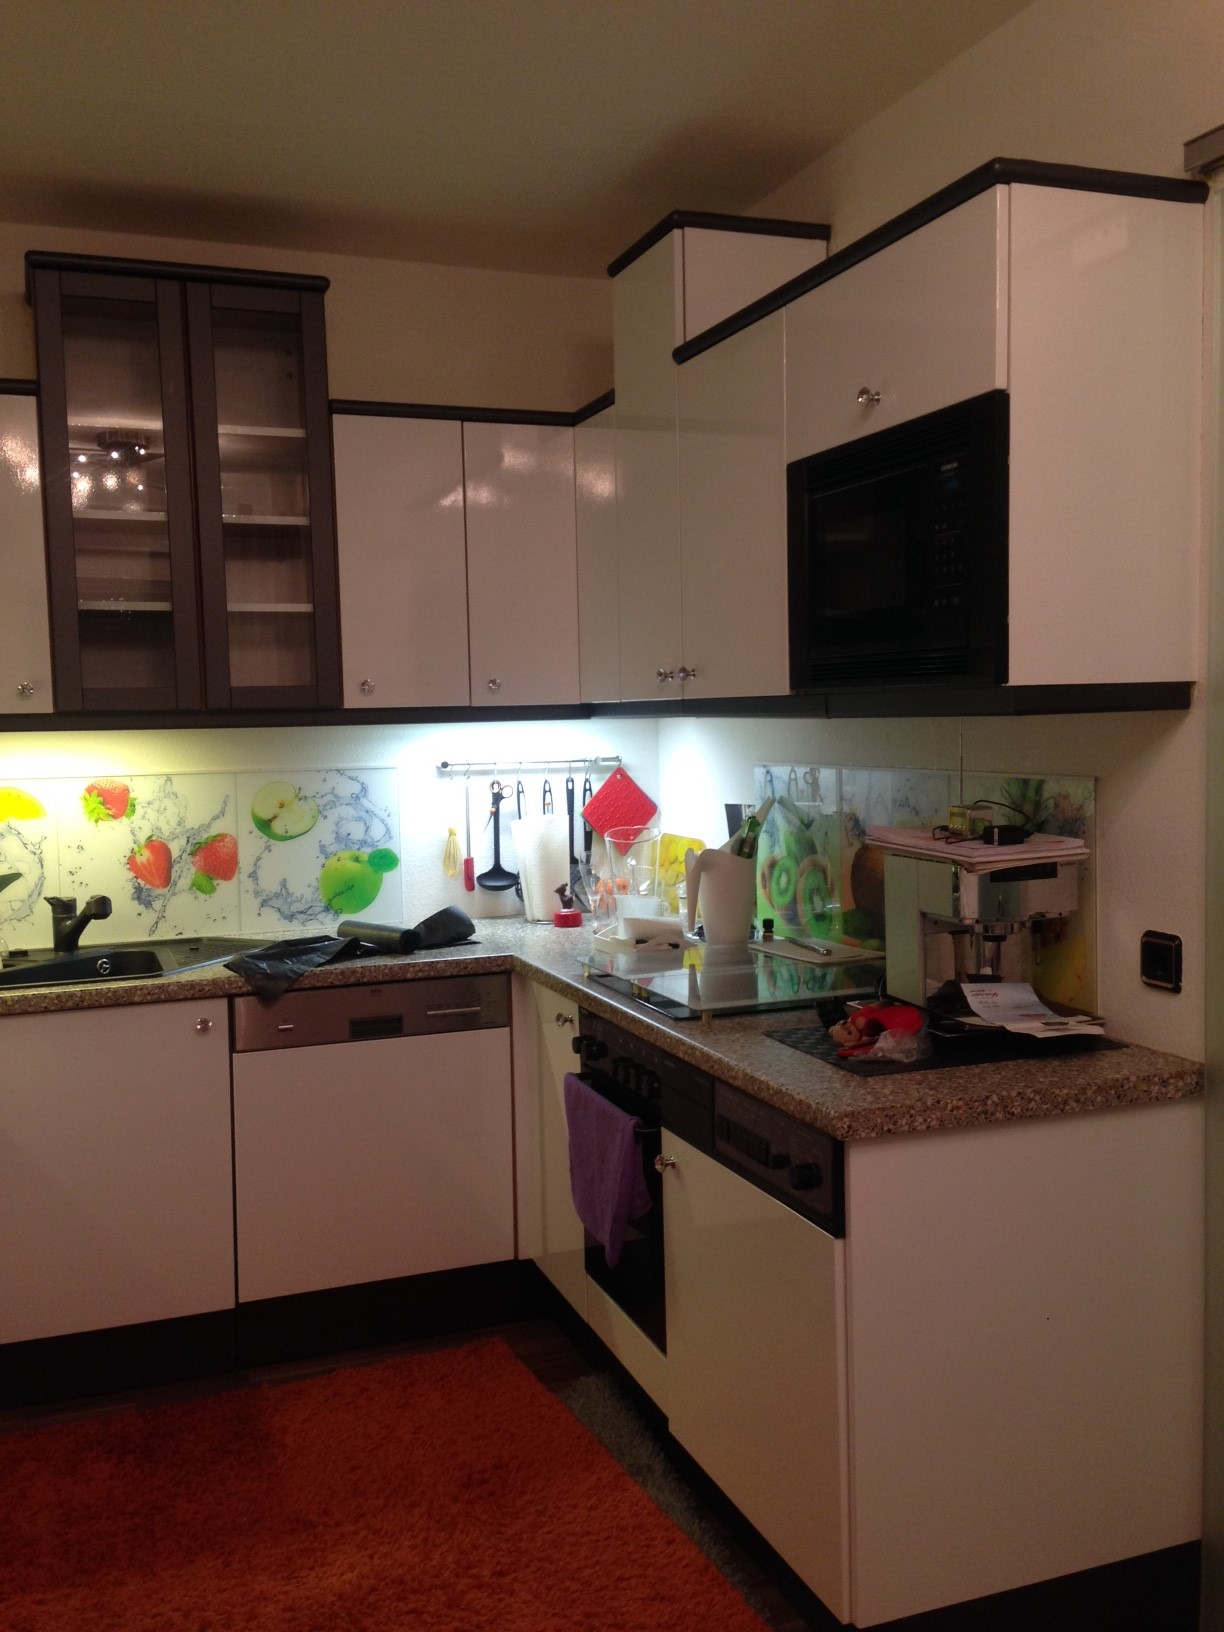 küche | küchenfolierung | folierung wien - Küche Neu Folieren